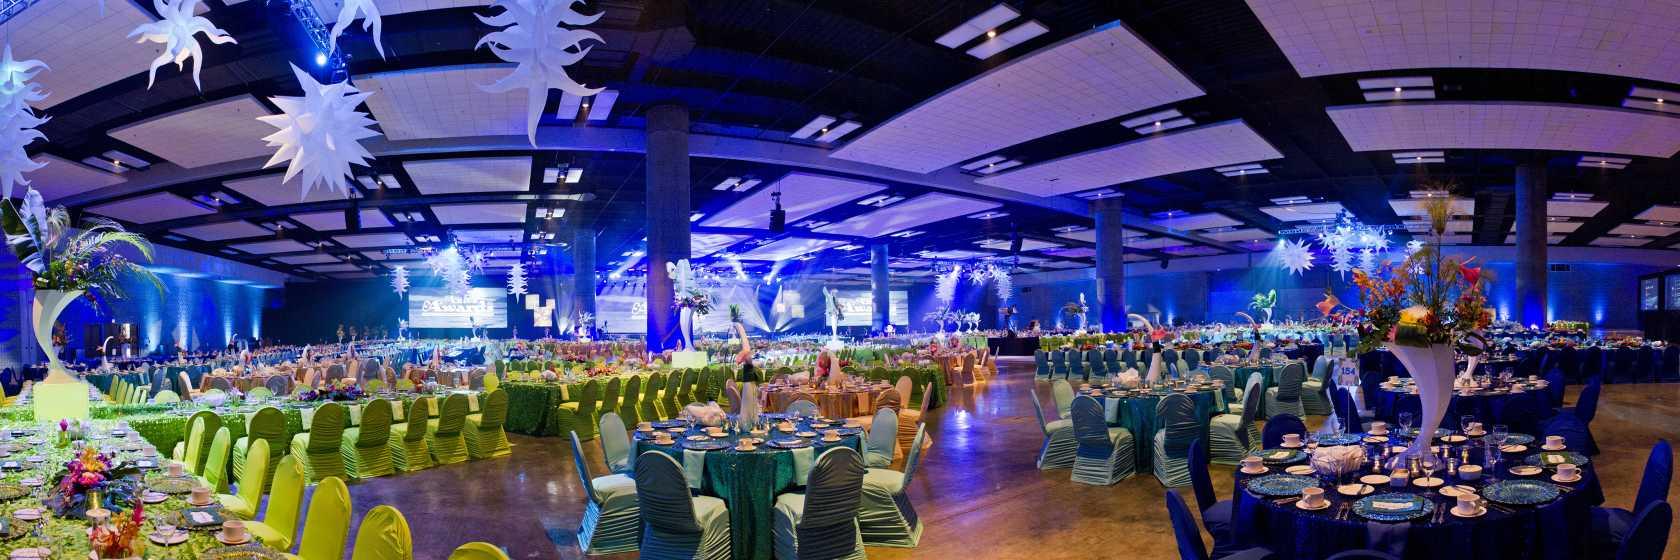 HCC F&B Exhall Banquet